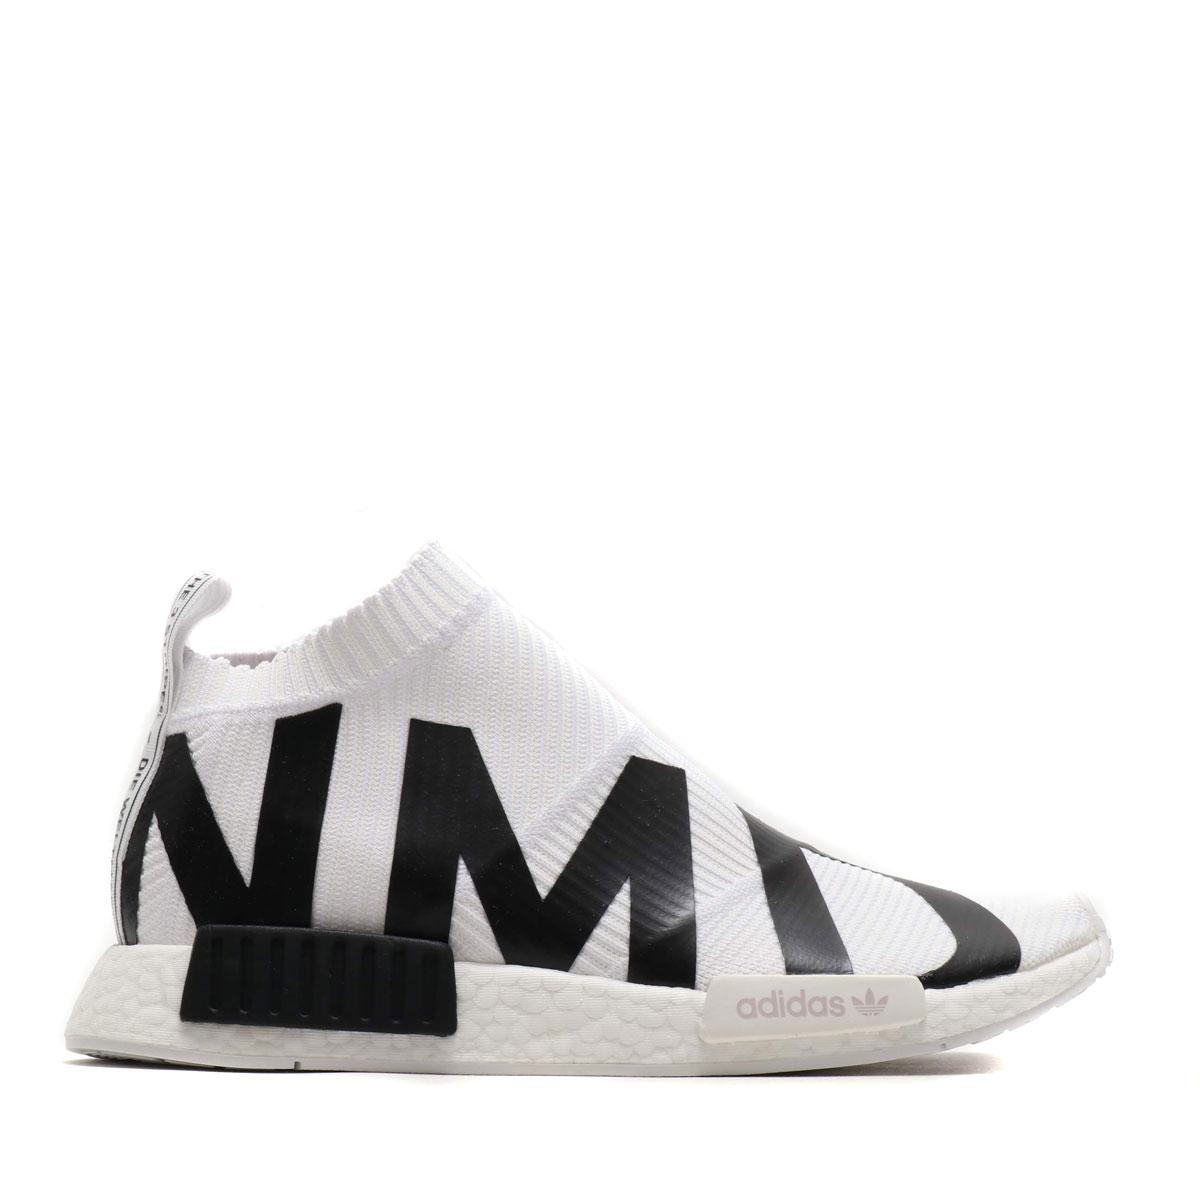 adidas nmd cs1 pk noir